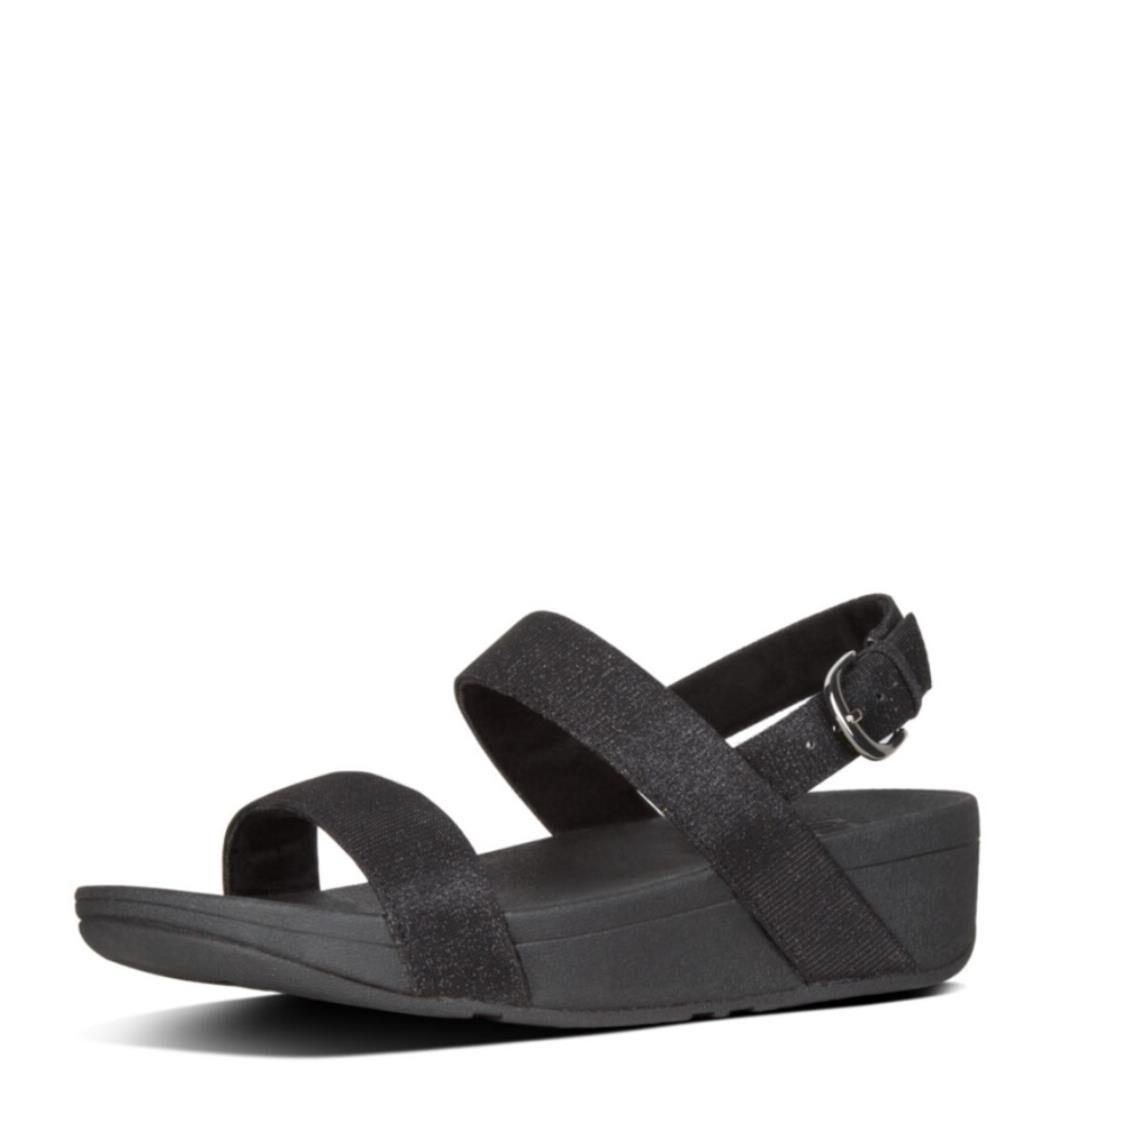 Fitflop Lottie Glitzy Sandal Black R20-001